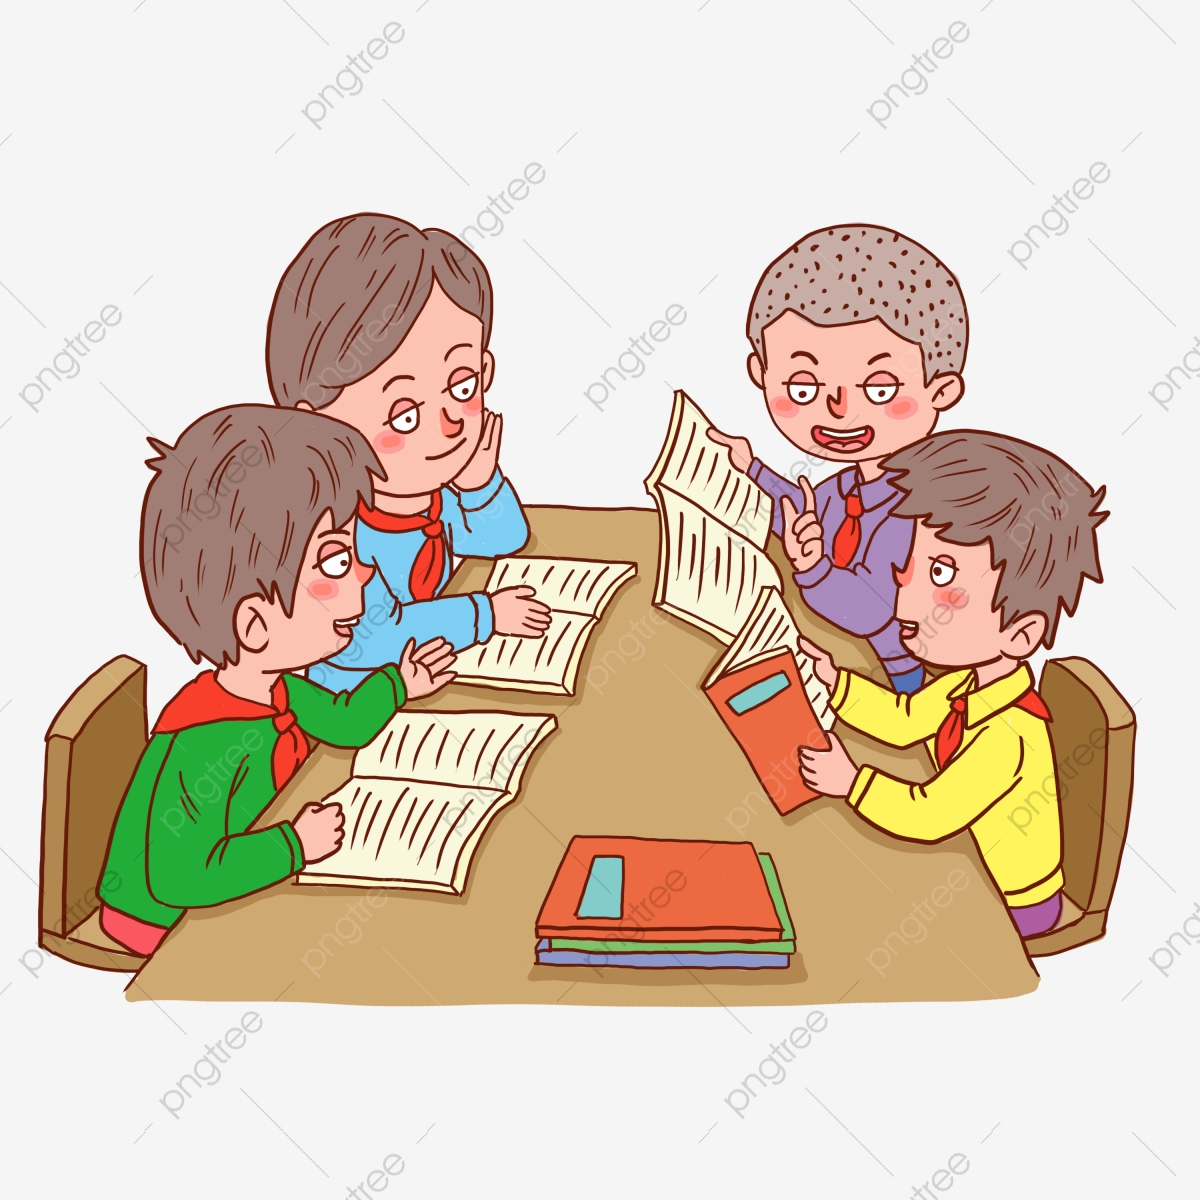 Pelajar Yang Mengambil Kelas Melakukan Kerja Rumah Belajar